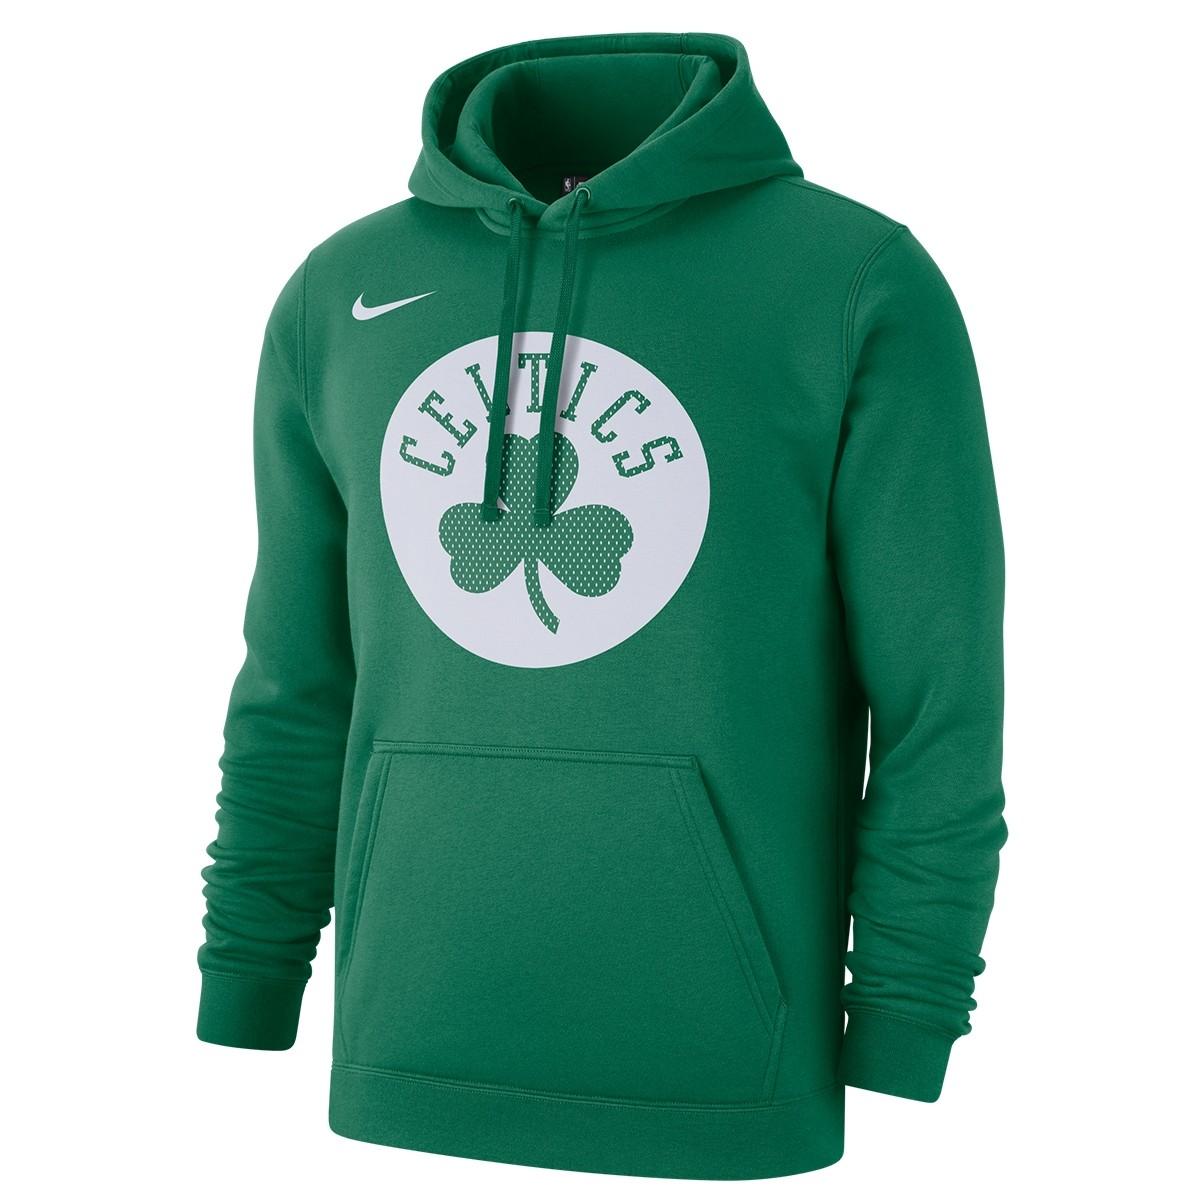 Nike Junior NBA Hoodie Logo 'Celtics'